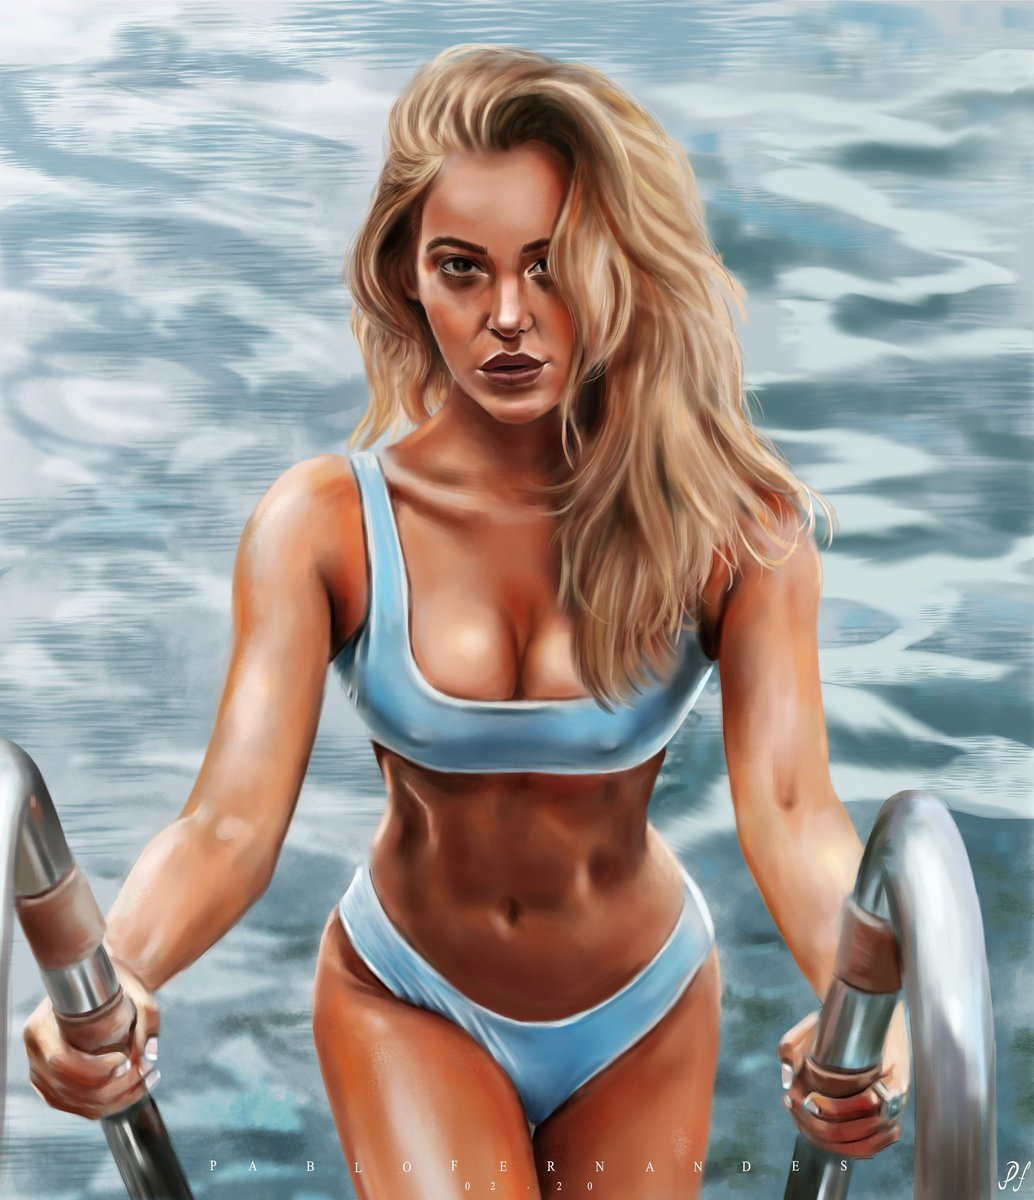 Summer Muse   #art #artdraw #drawing #digitalart #digitalpainting #dibujo #portrait #portfolio #photography #krita #studie #photoshop #instaart #instagood #artwork #artworld #summer #beach #pool #muse #girl #blond #loira #pinturadigitalpic.twitter.com/k3WHtwn3Df